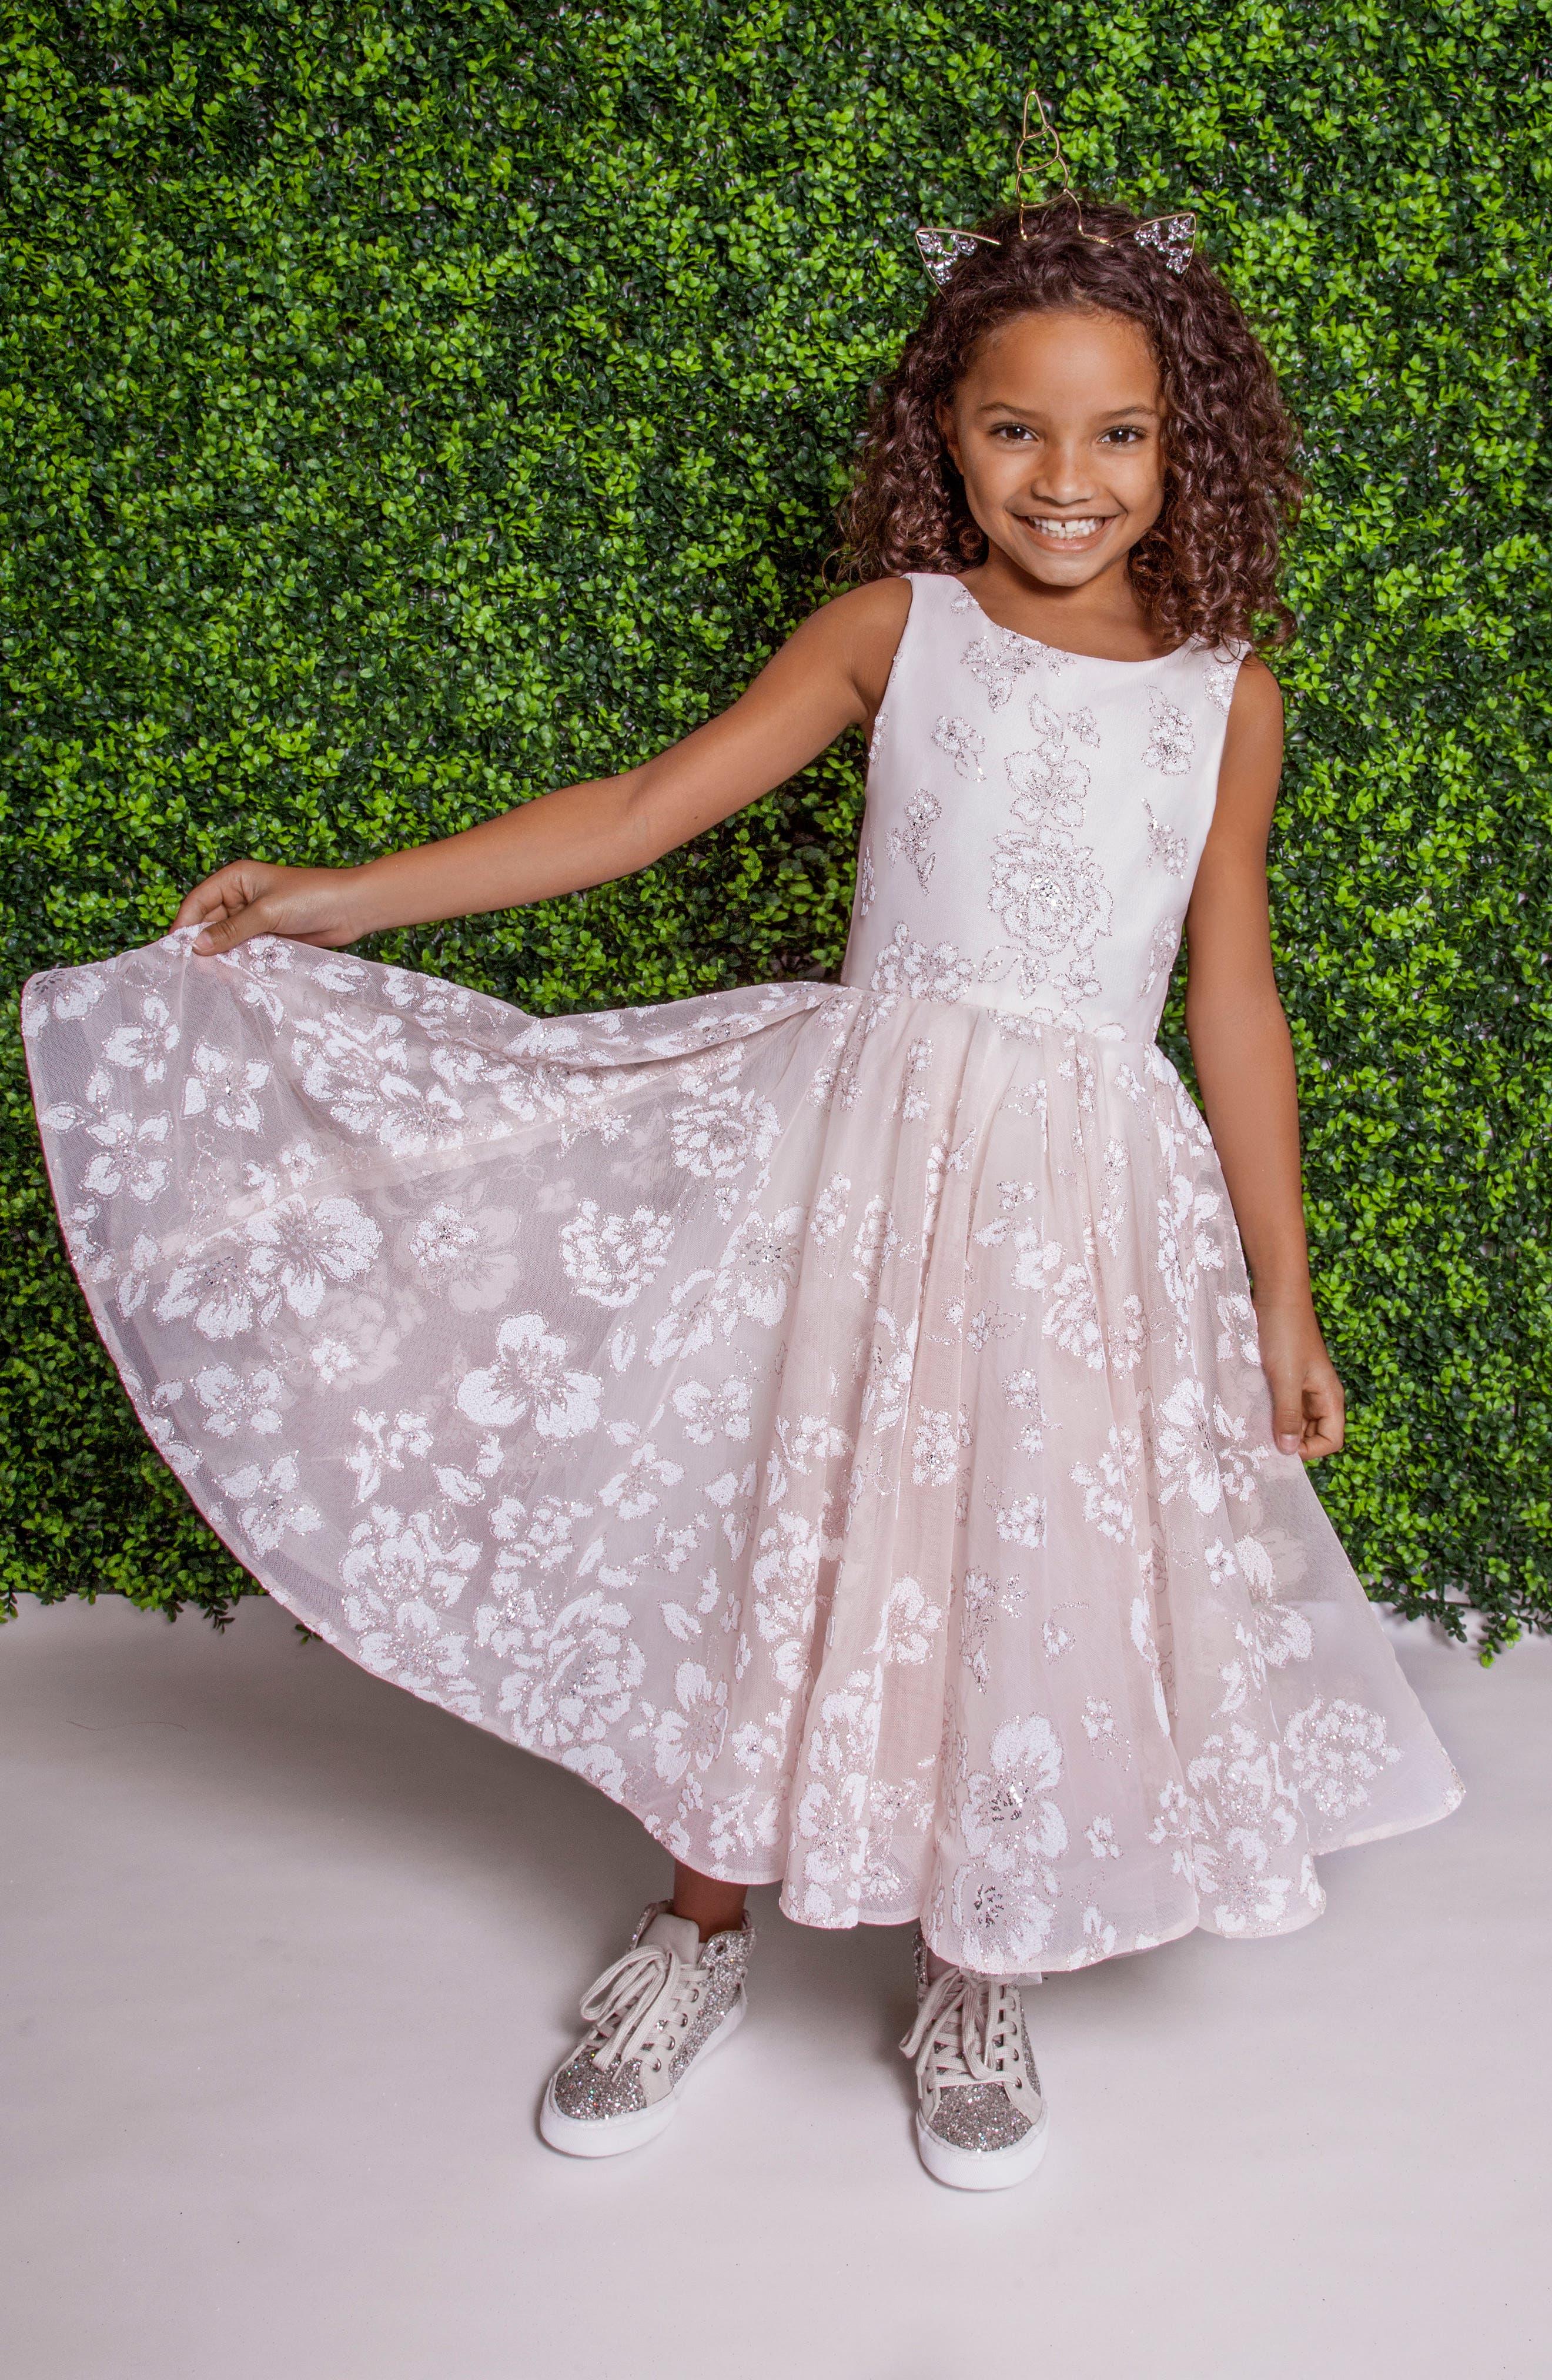 Eloise Beaded Flower Girl Dress,                         Main,                         color, SANDWASHED ORCHID